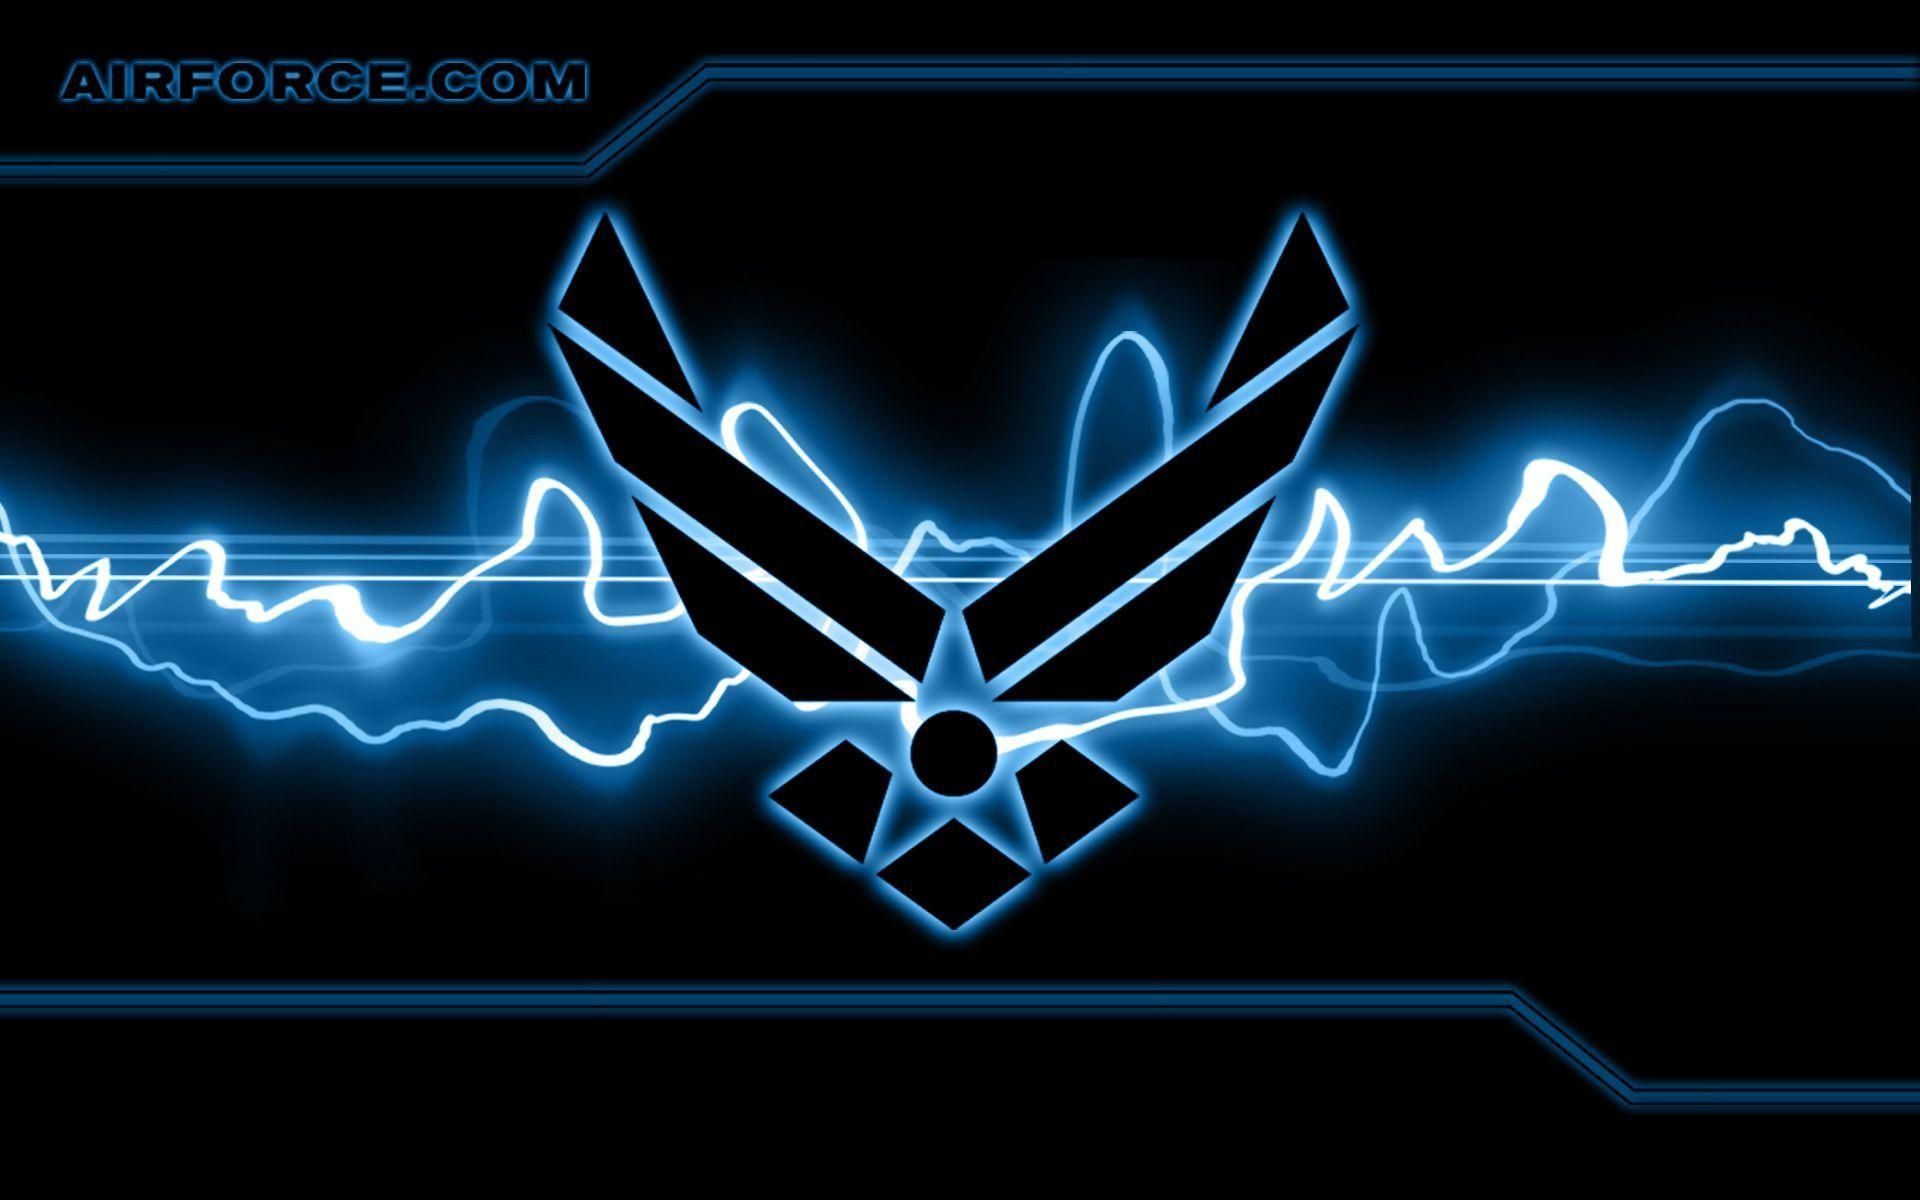 Air force logo wallpaper 54 images 1920x1200 air force logo wallpaper iphone air force wallpapers best biocorpaavc